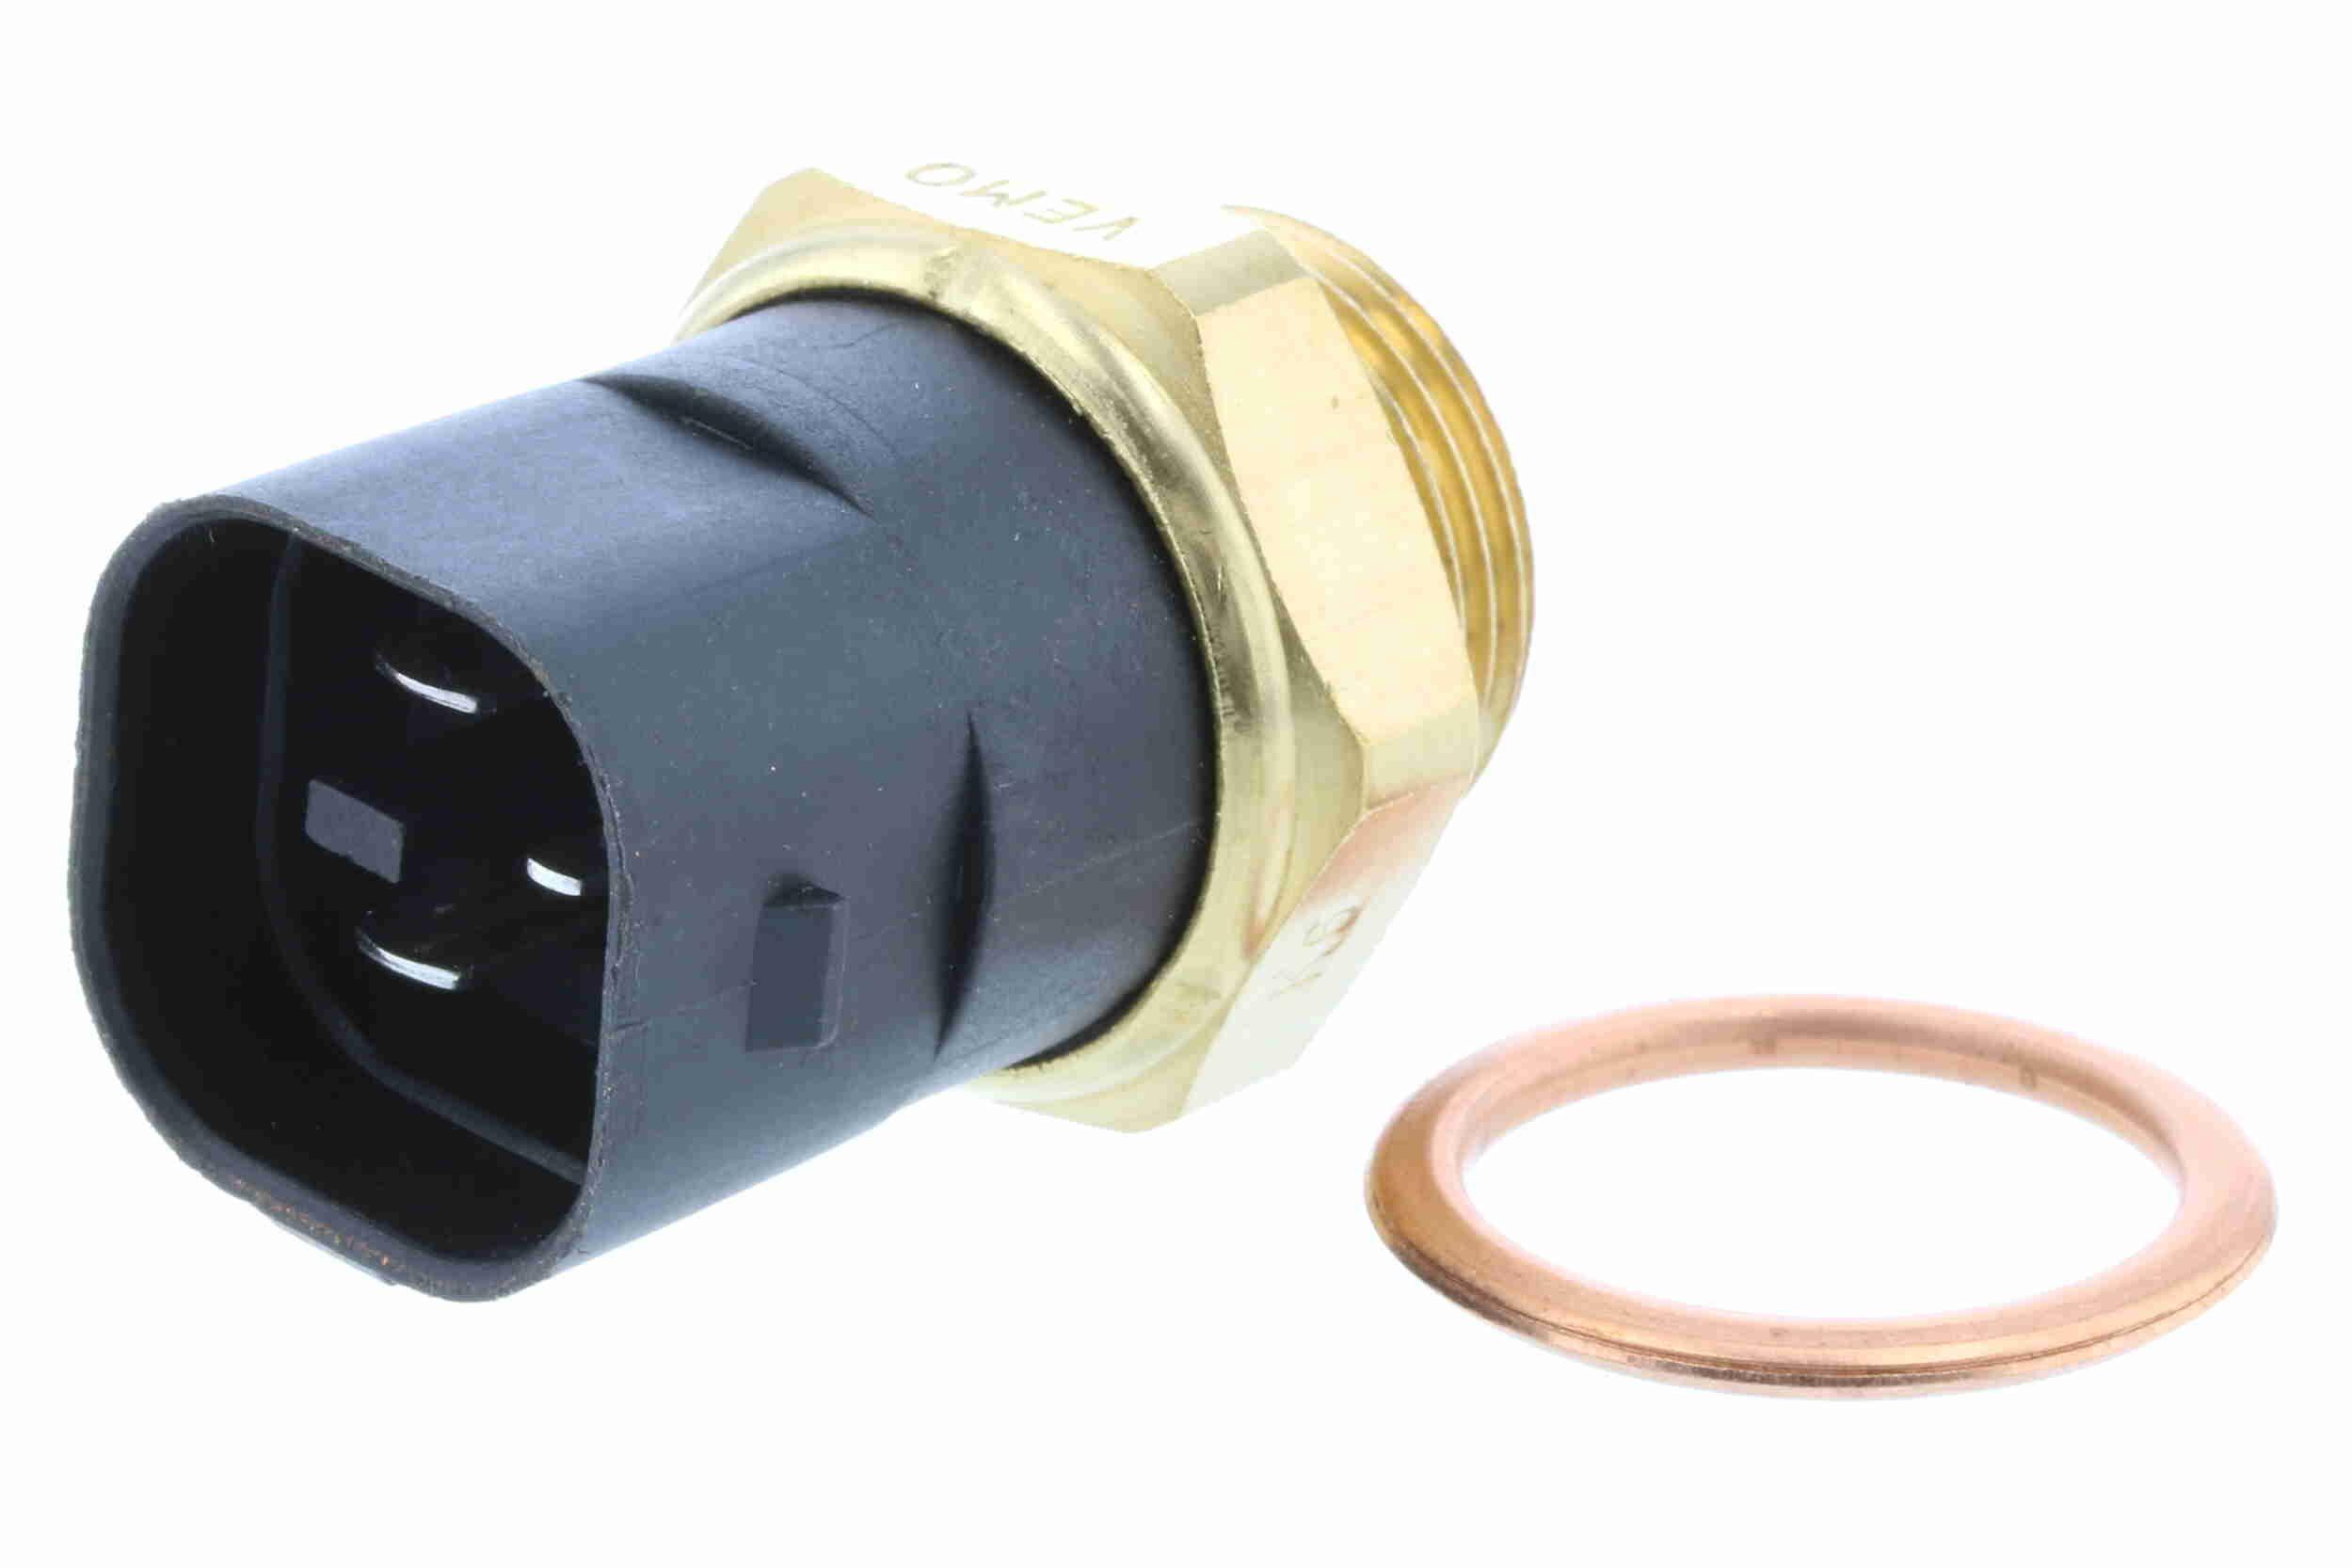 VEMO: Original Thermoschalter Lüfter V15-99-1977-1 (Pol-Anzahl: 3-polig)